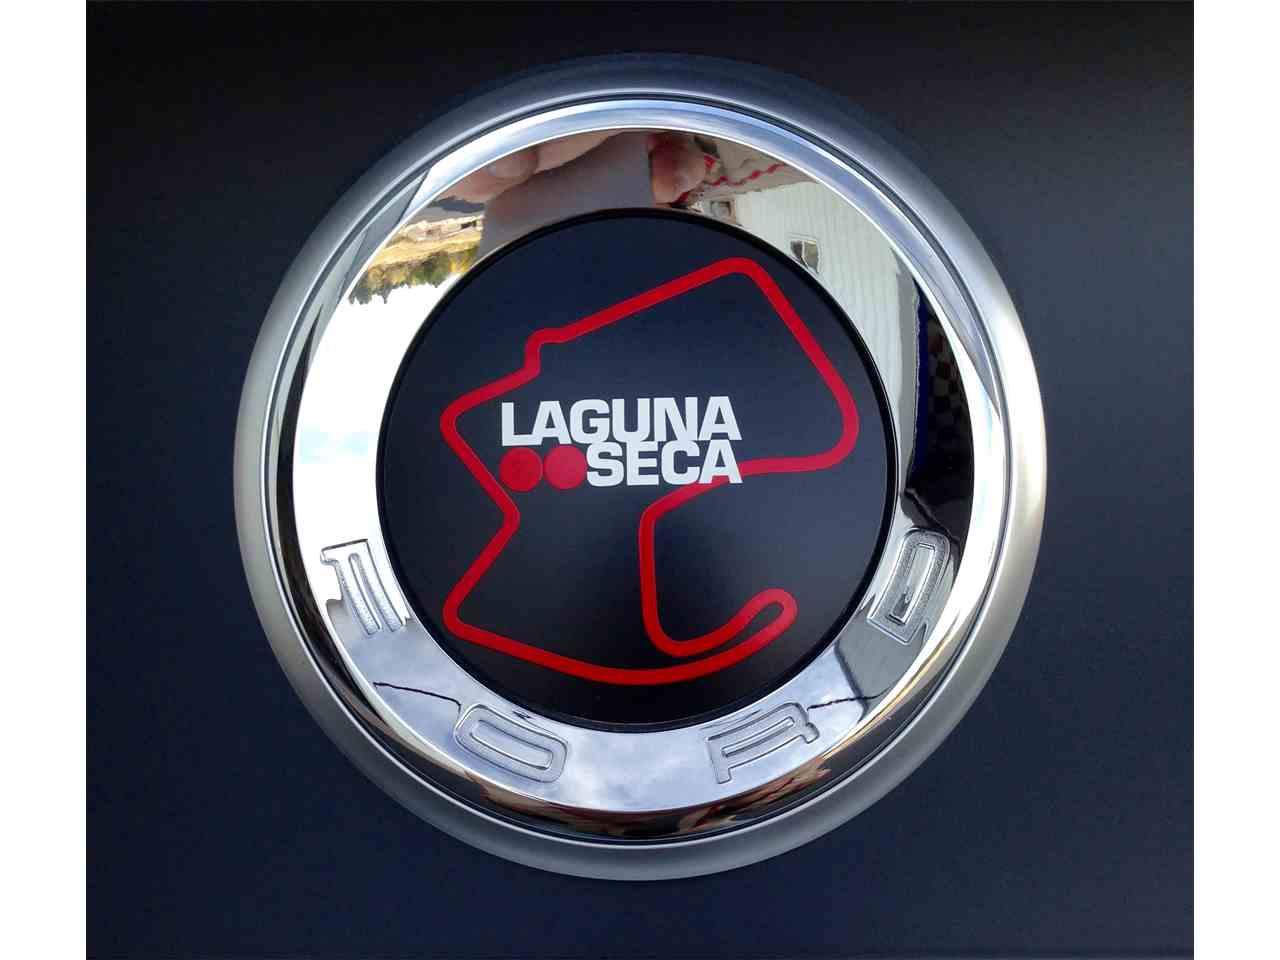 Large Picture of '12 BOSS 302- LAGUNA SECA - LABA